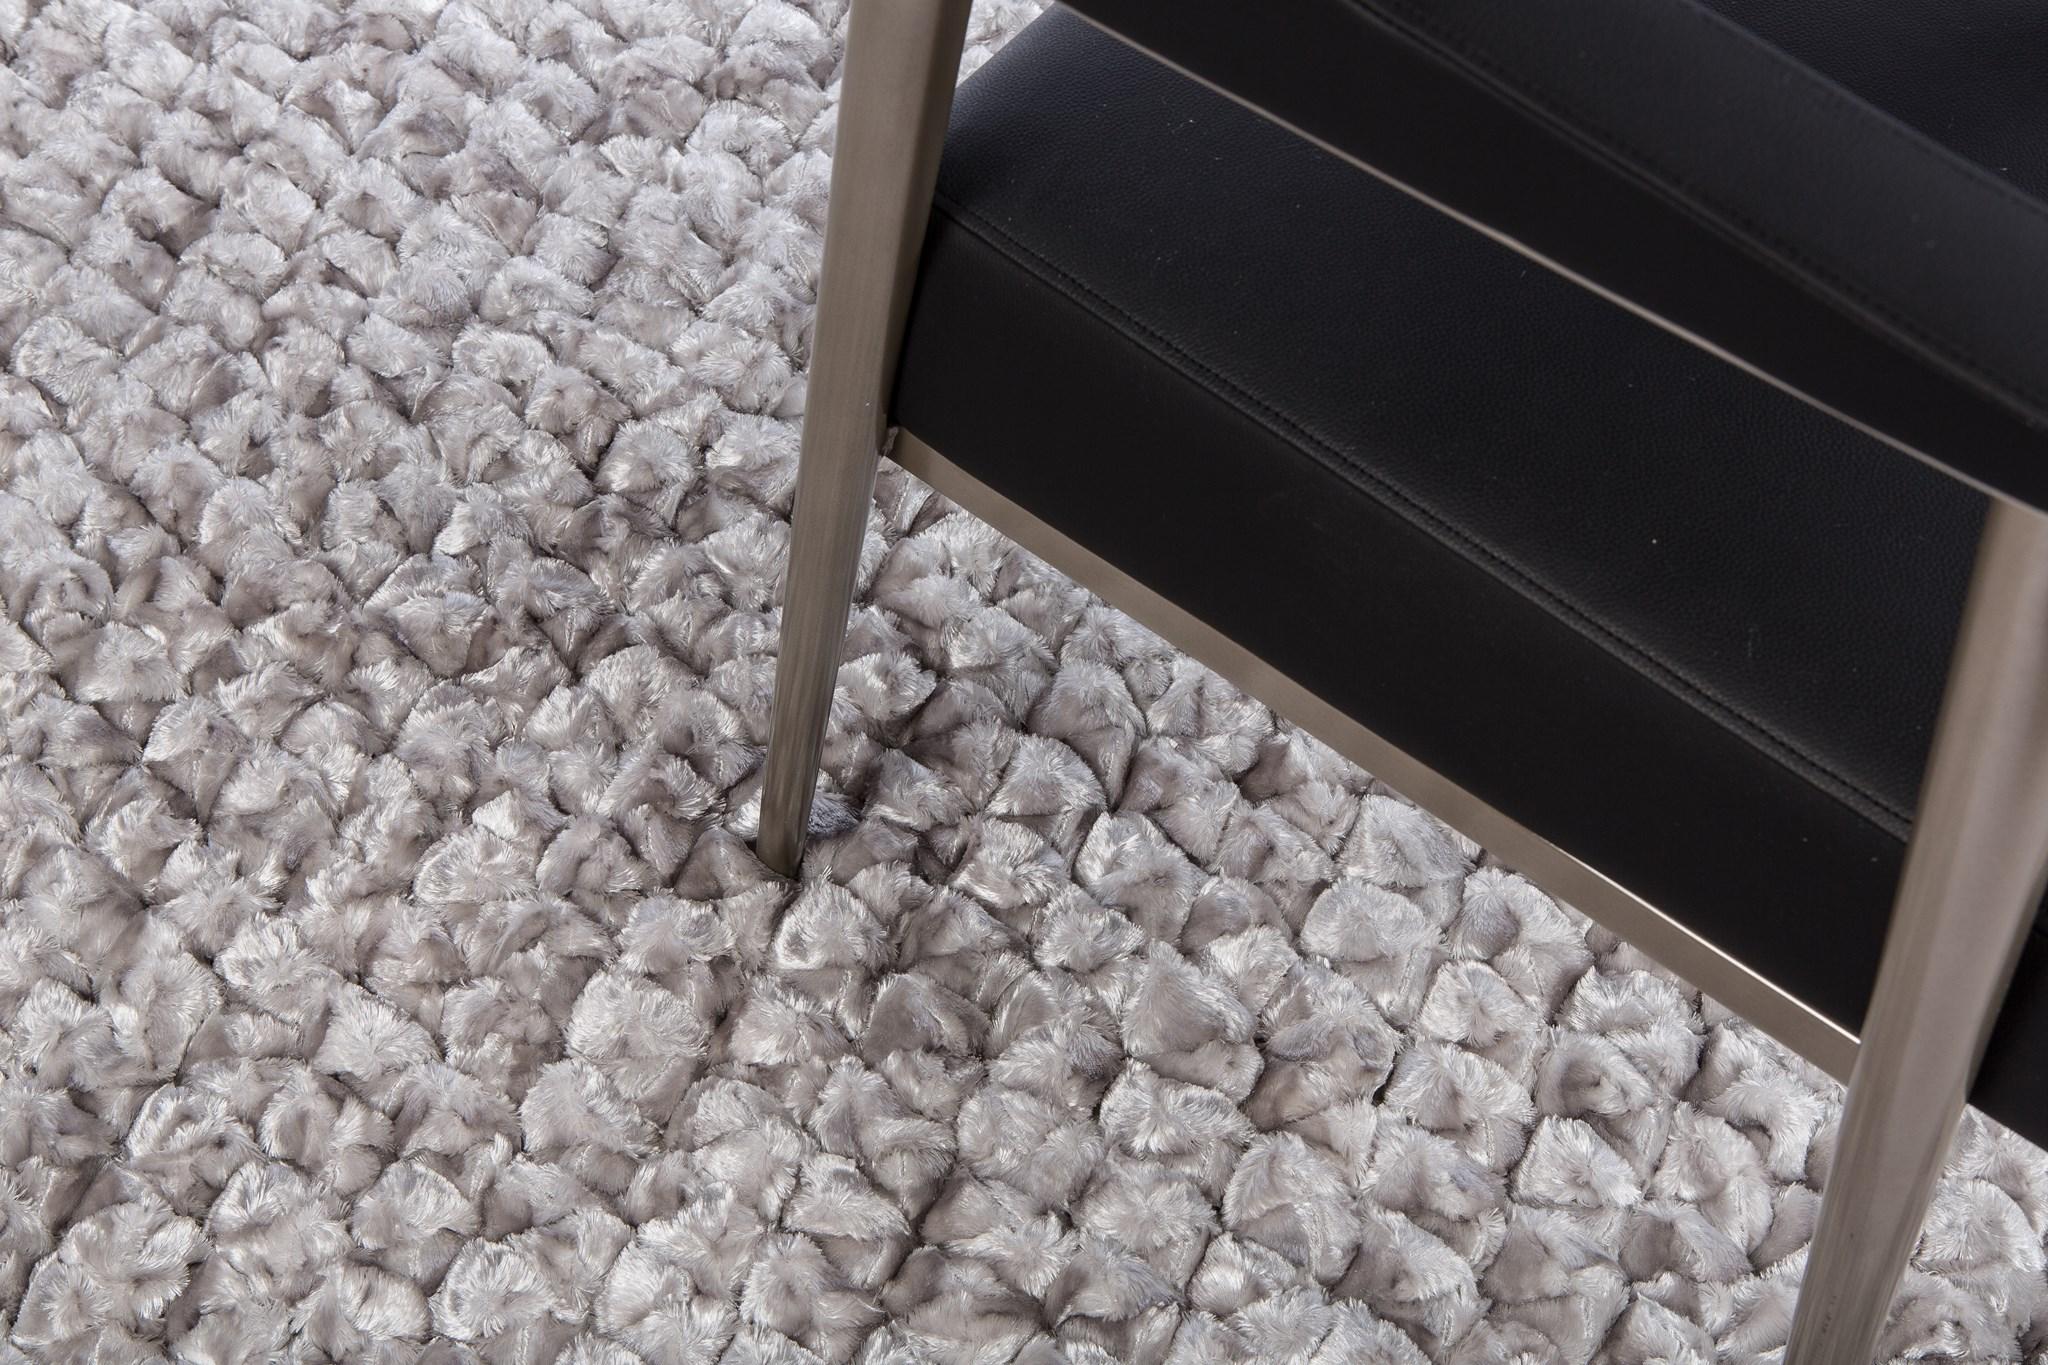 Shimmer Pebble Rug: 6'x9' Chrome